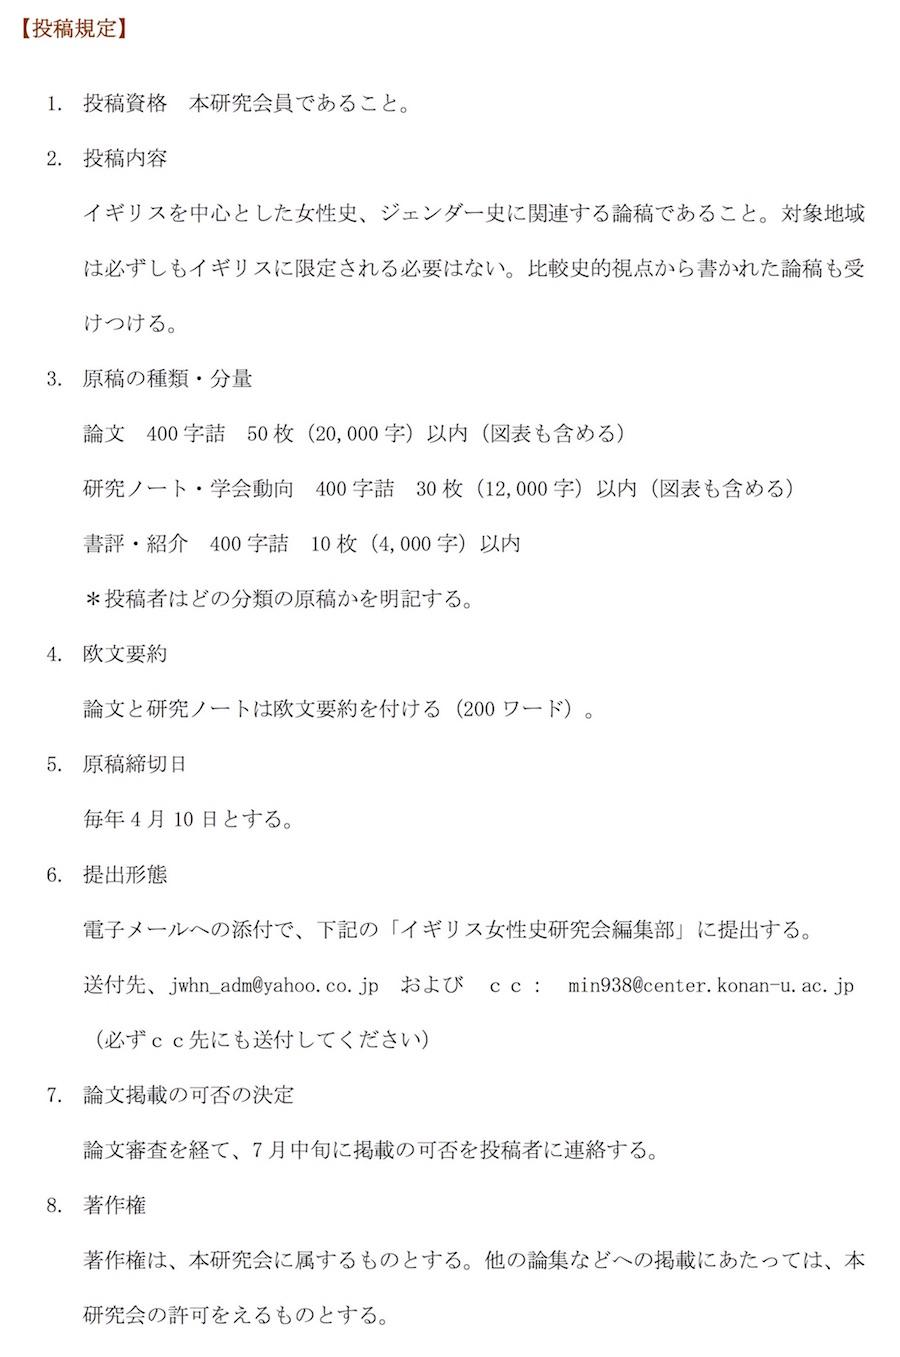 kaiho_bosu_05_02